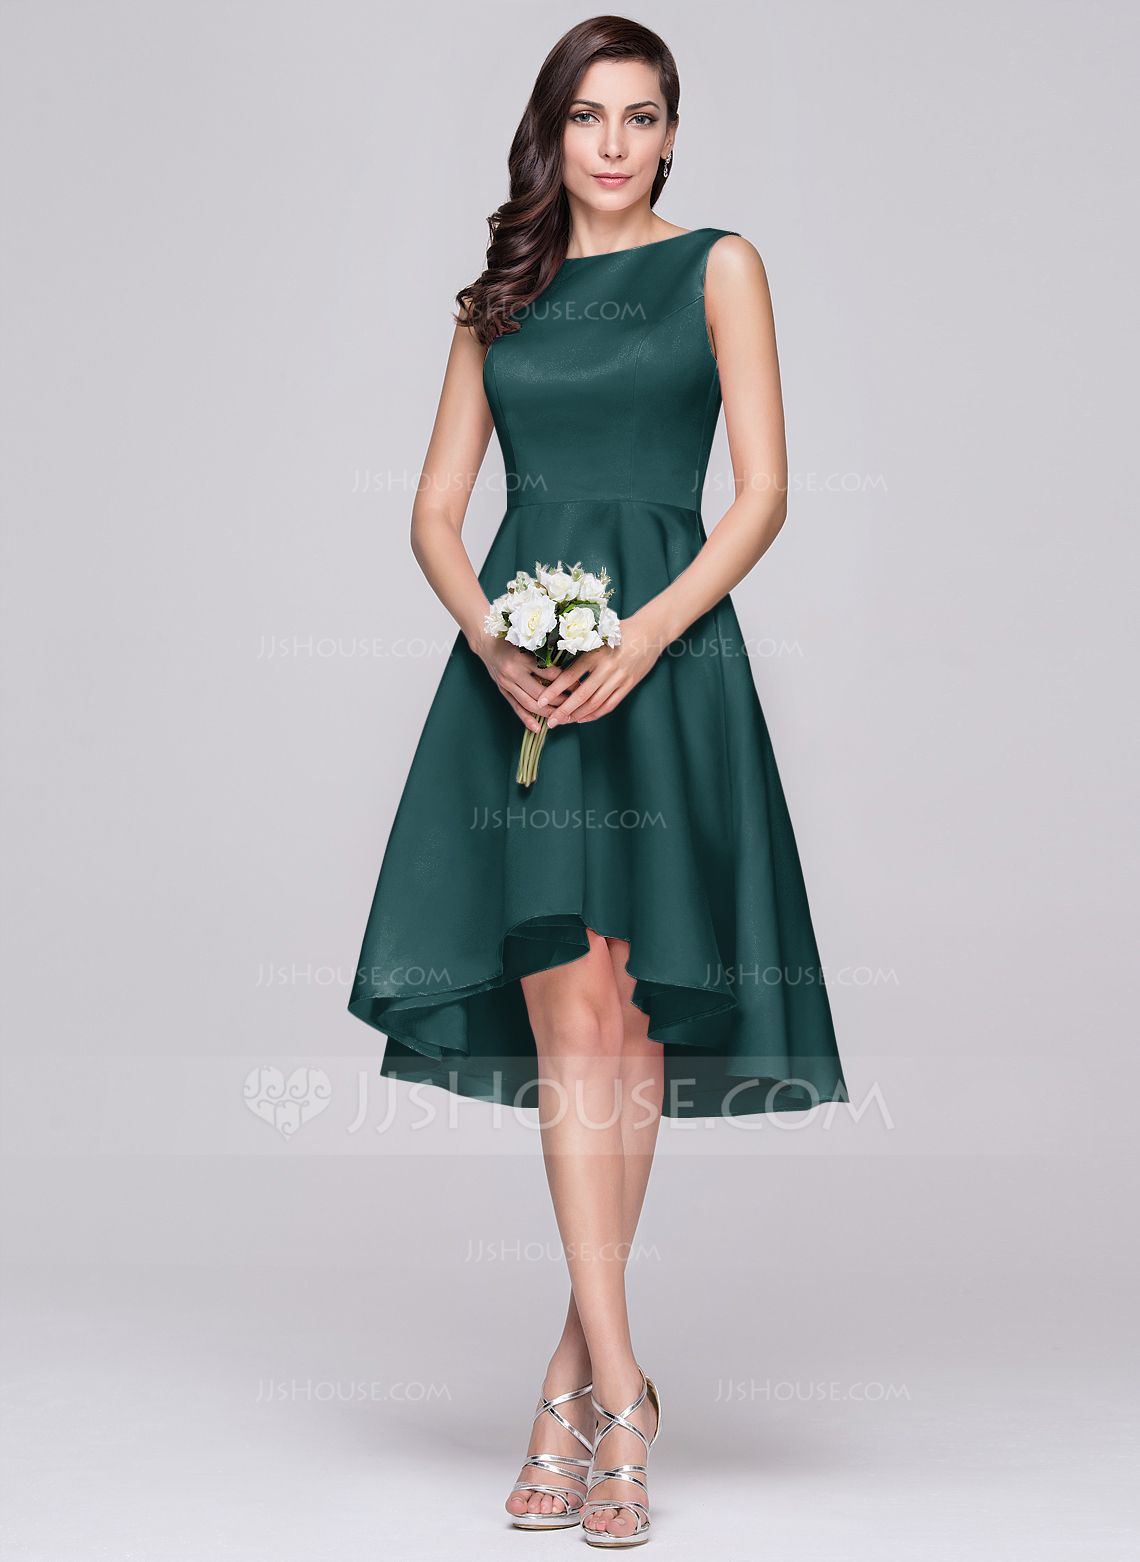 01564081d10b A-Line/Princess Scoop Neck Asymmetrical Satin Bridesmaid Dress (007060608)  - Bridesmaid Dresses - JJsHouse